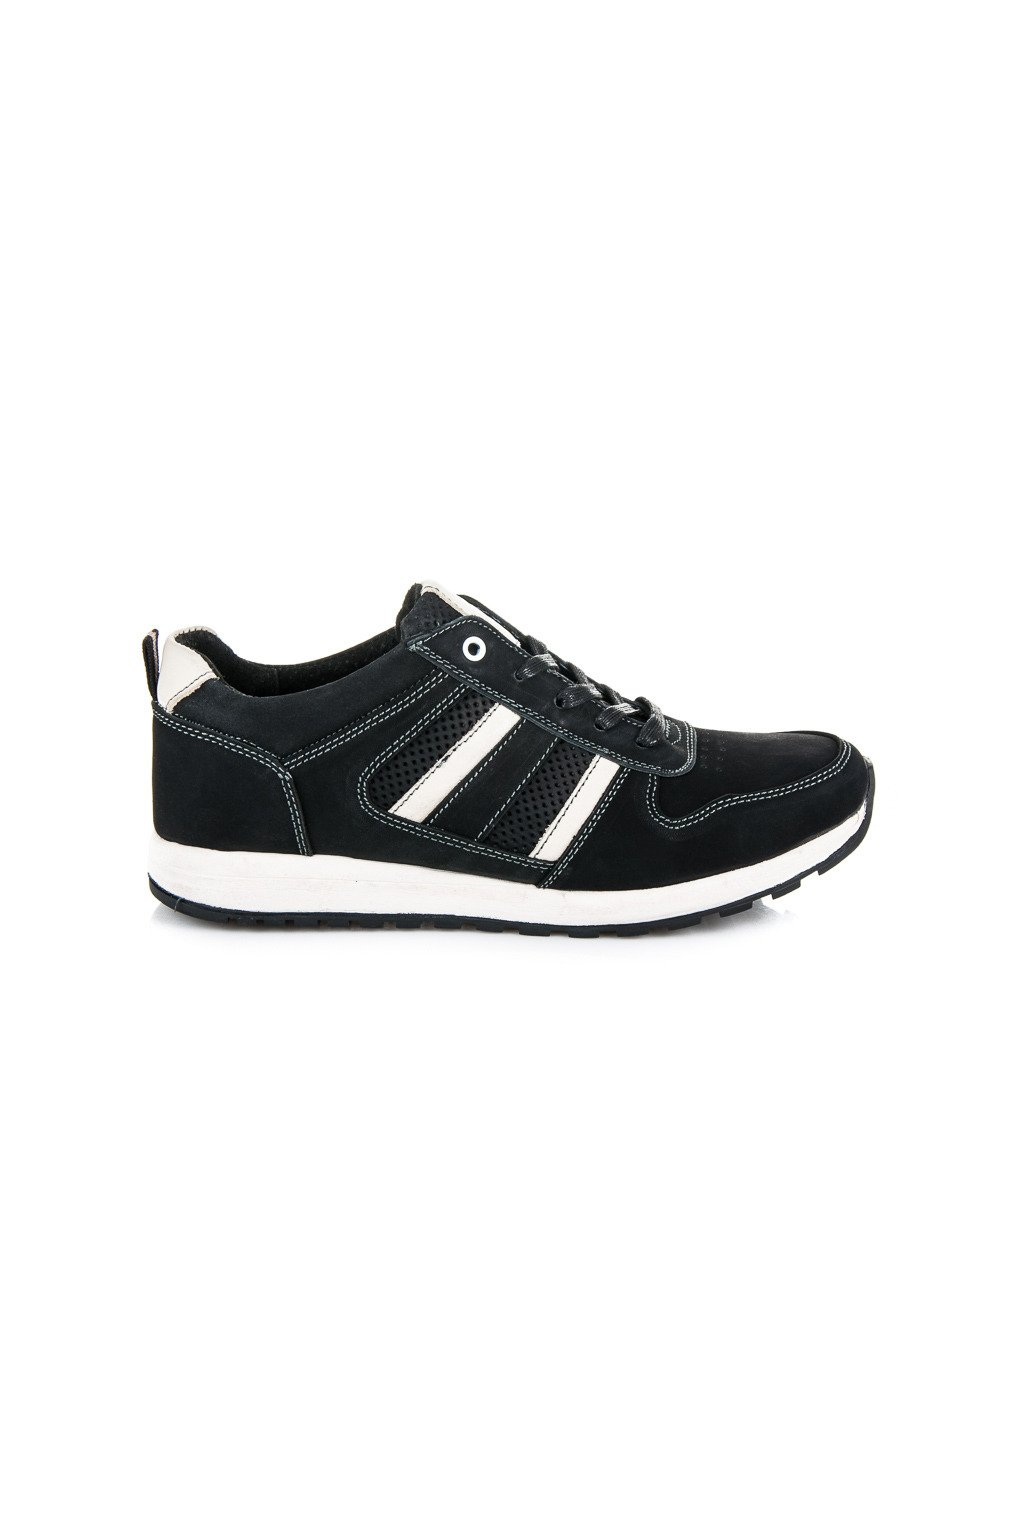 Pánska obuv Mazaro SD73-1B Koža  5fb69b69d01